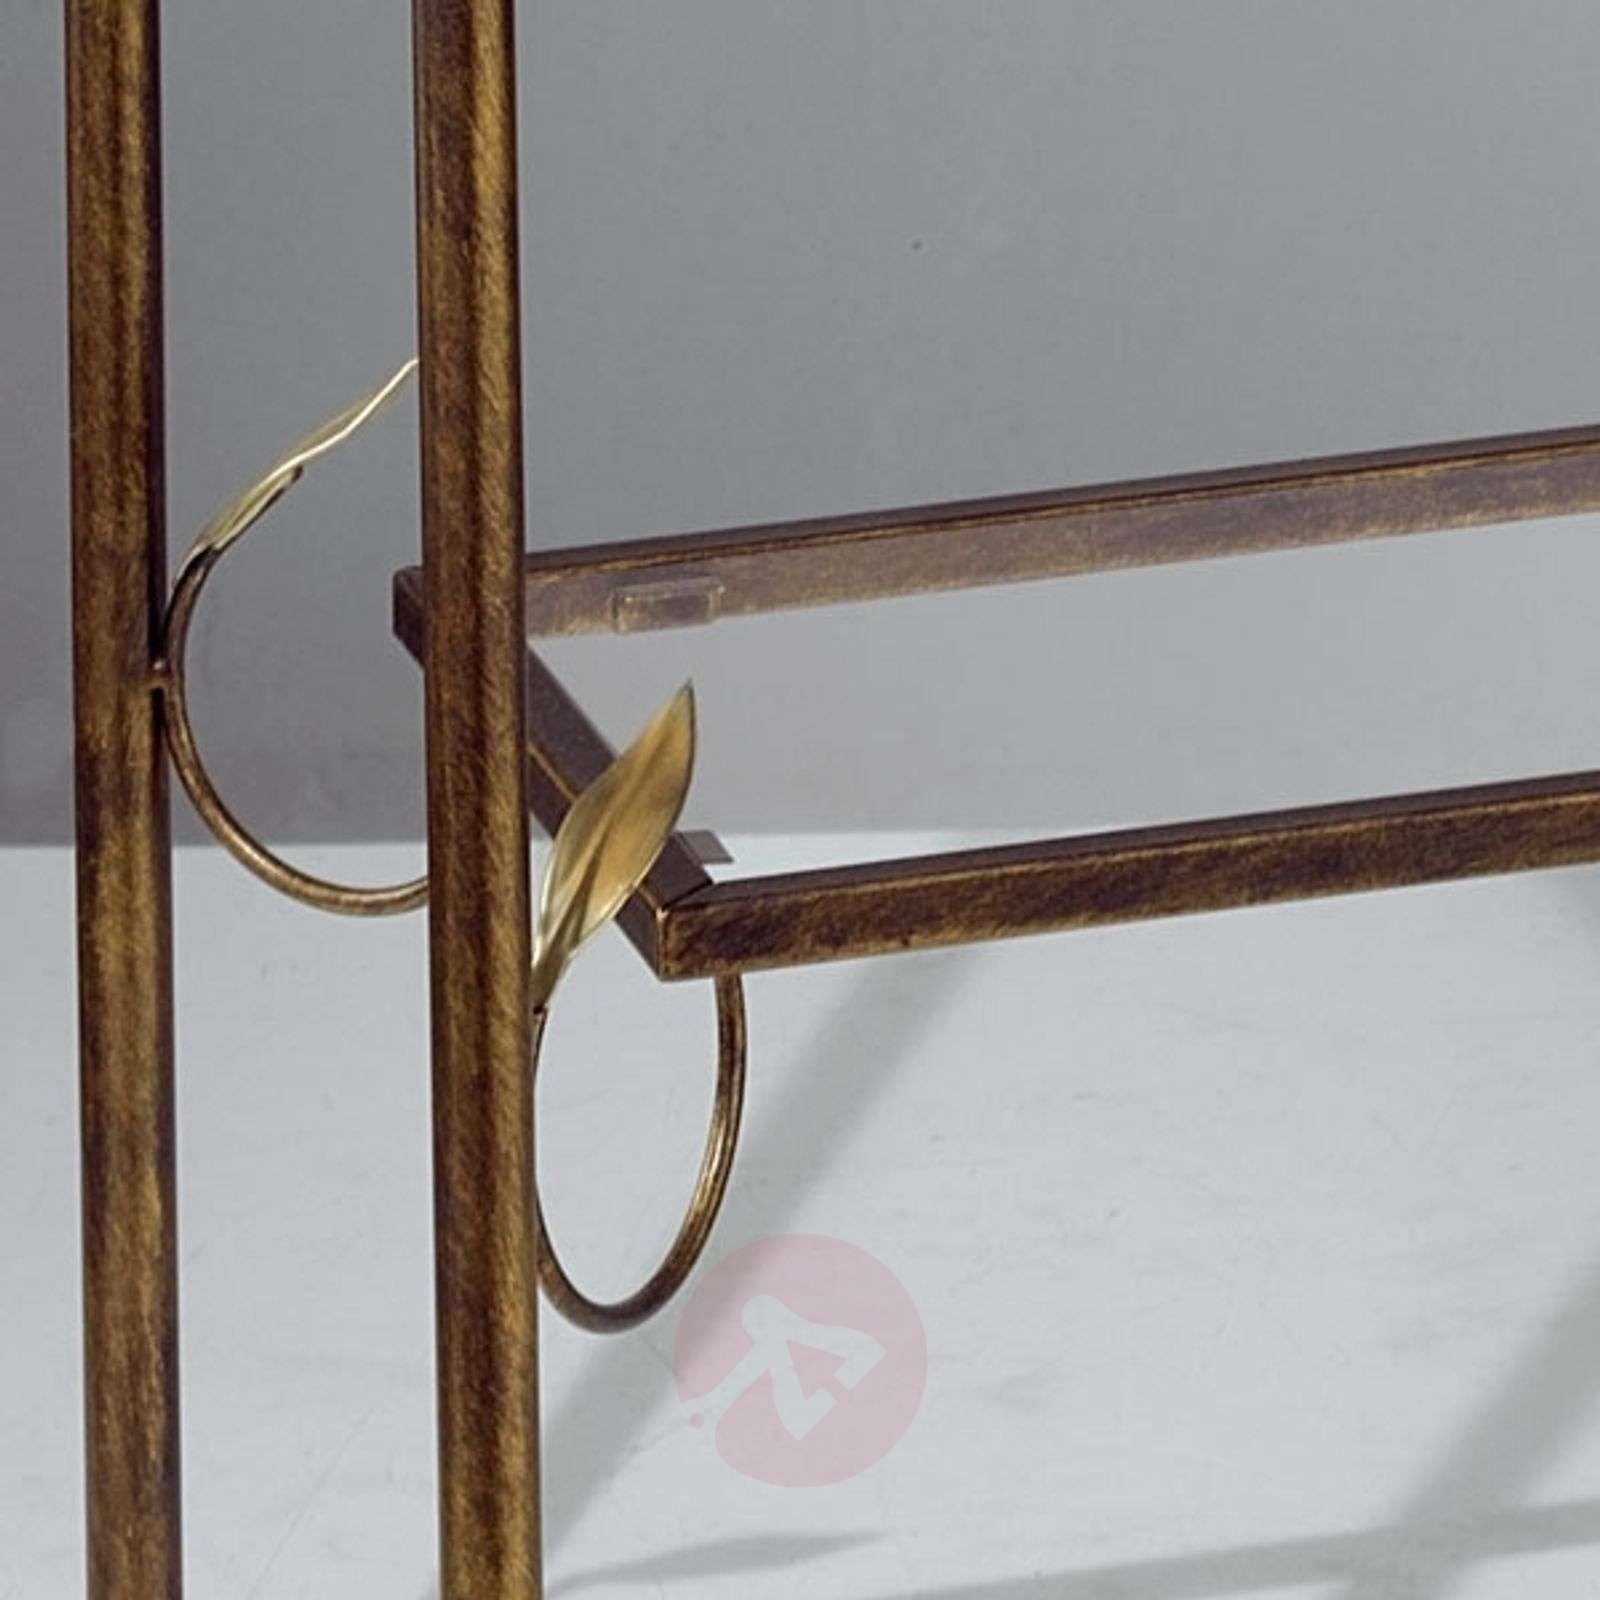 Table CAMPANA 70x30cm-5505318-01